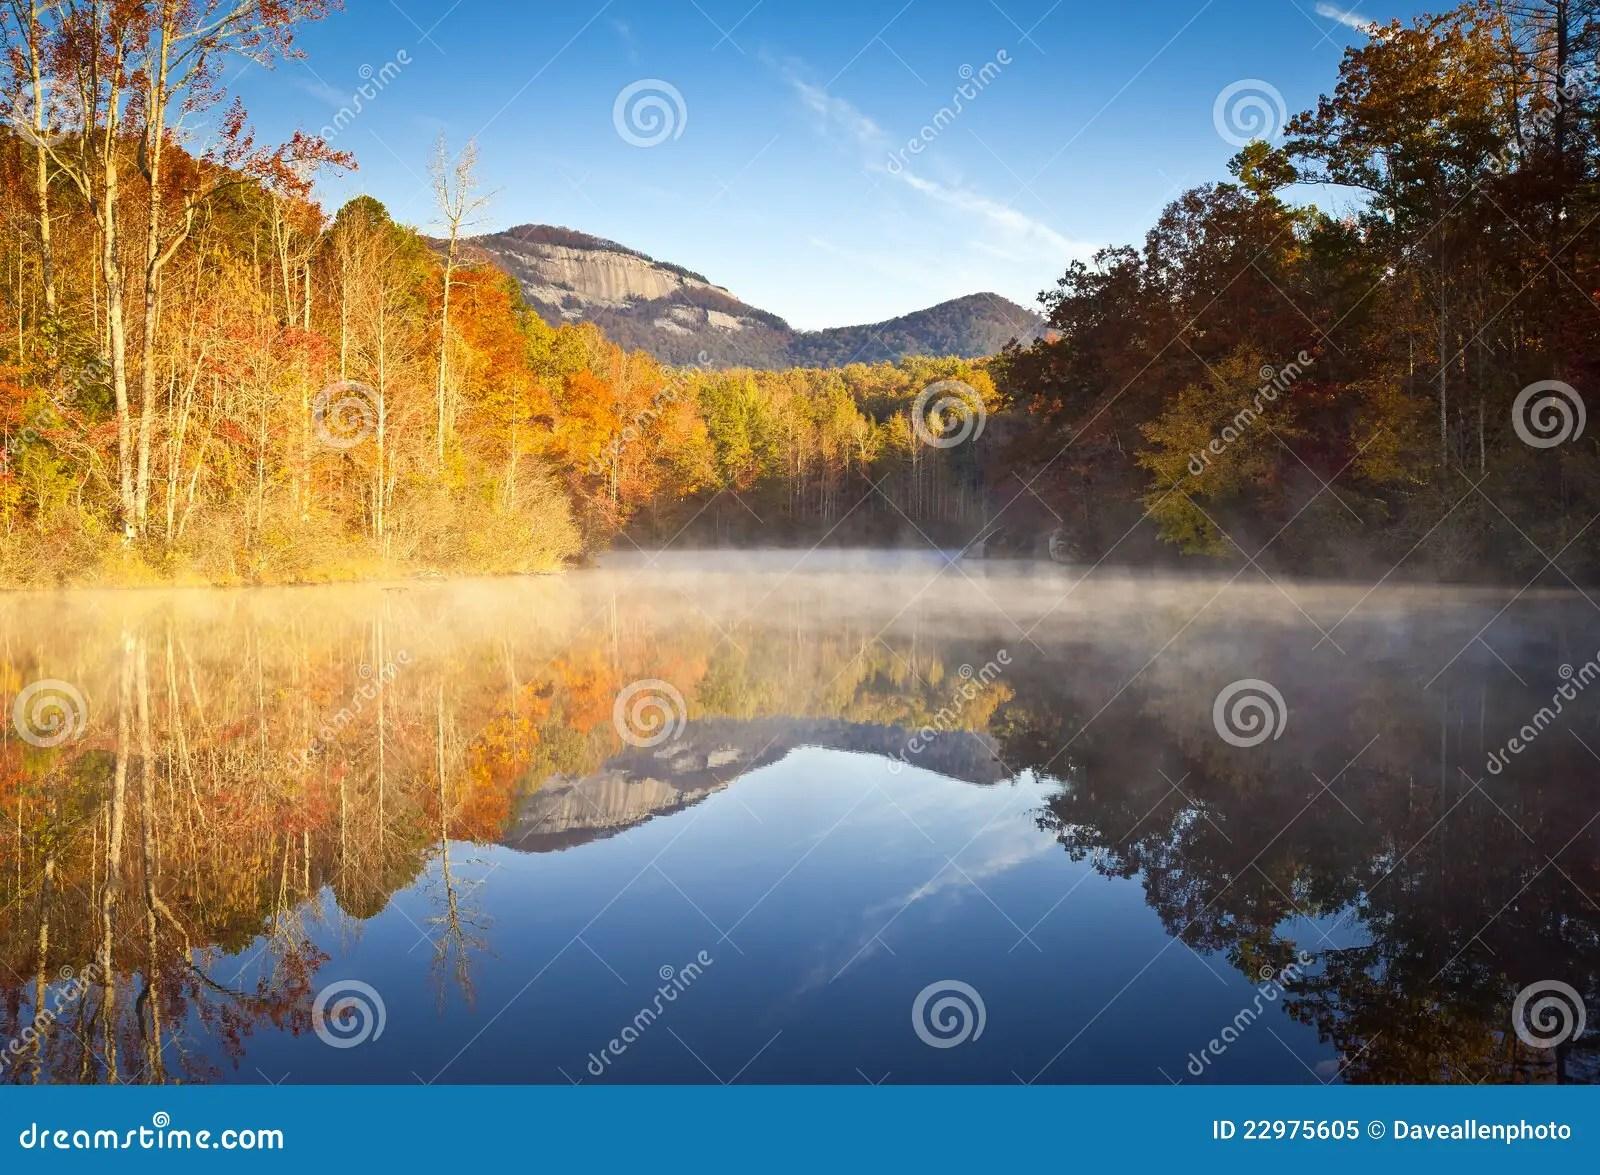 Fall Smoky Mountains Wallpaper South Carolina Autumn Landscape Table Rock Fall Royalty